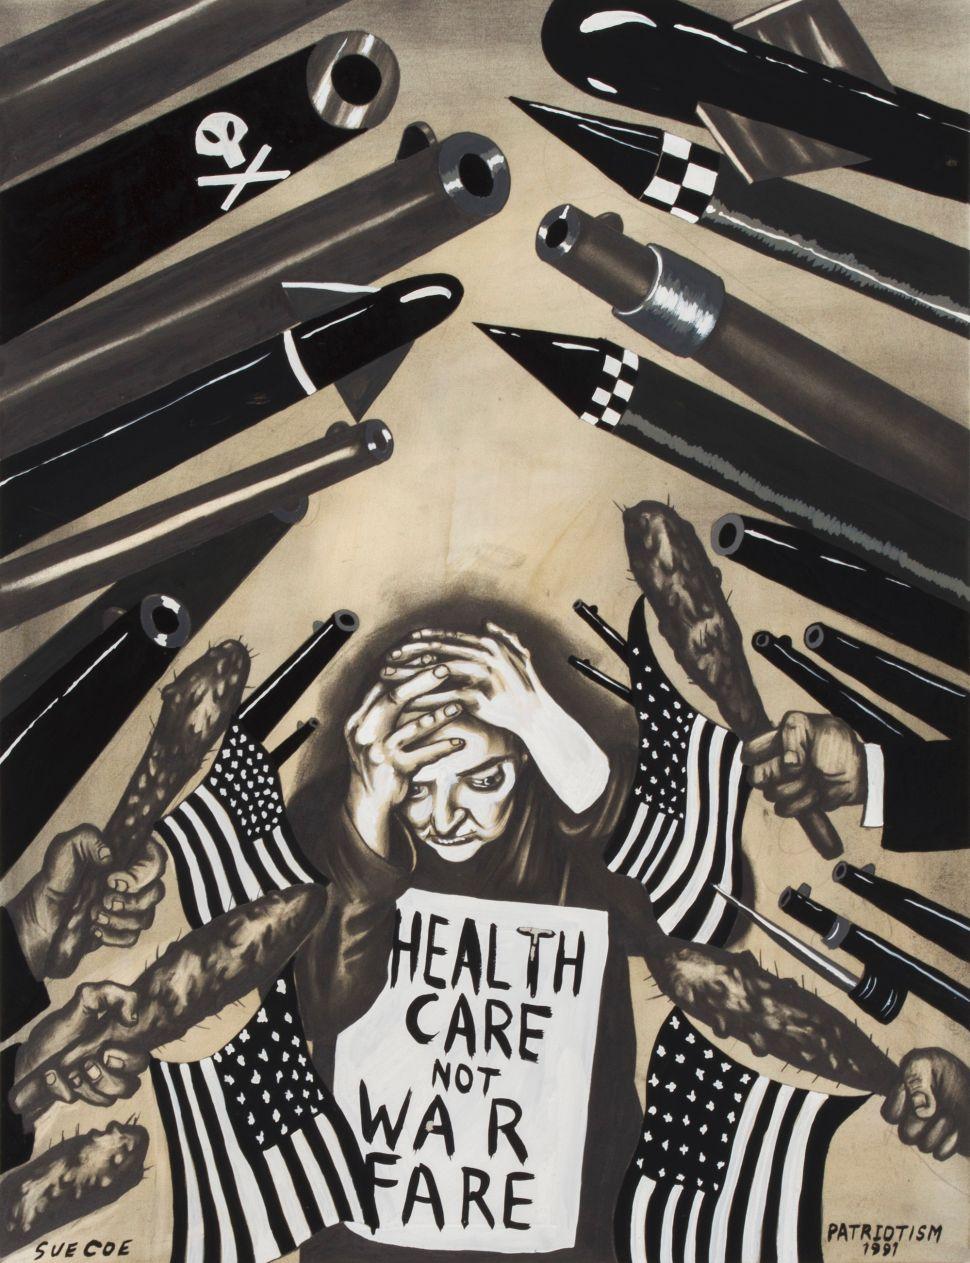 A Century Later, Artist Sue Coe Takes Up Käthe Kollwitz's Social Justice Crusade